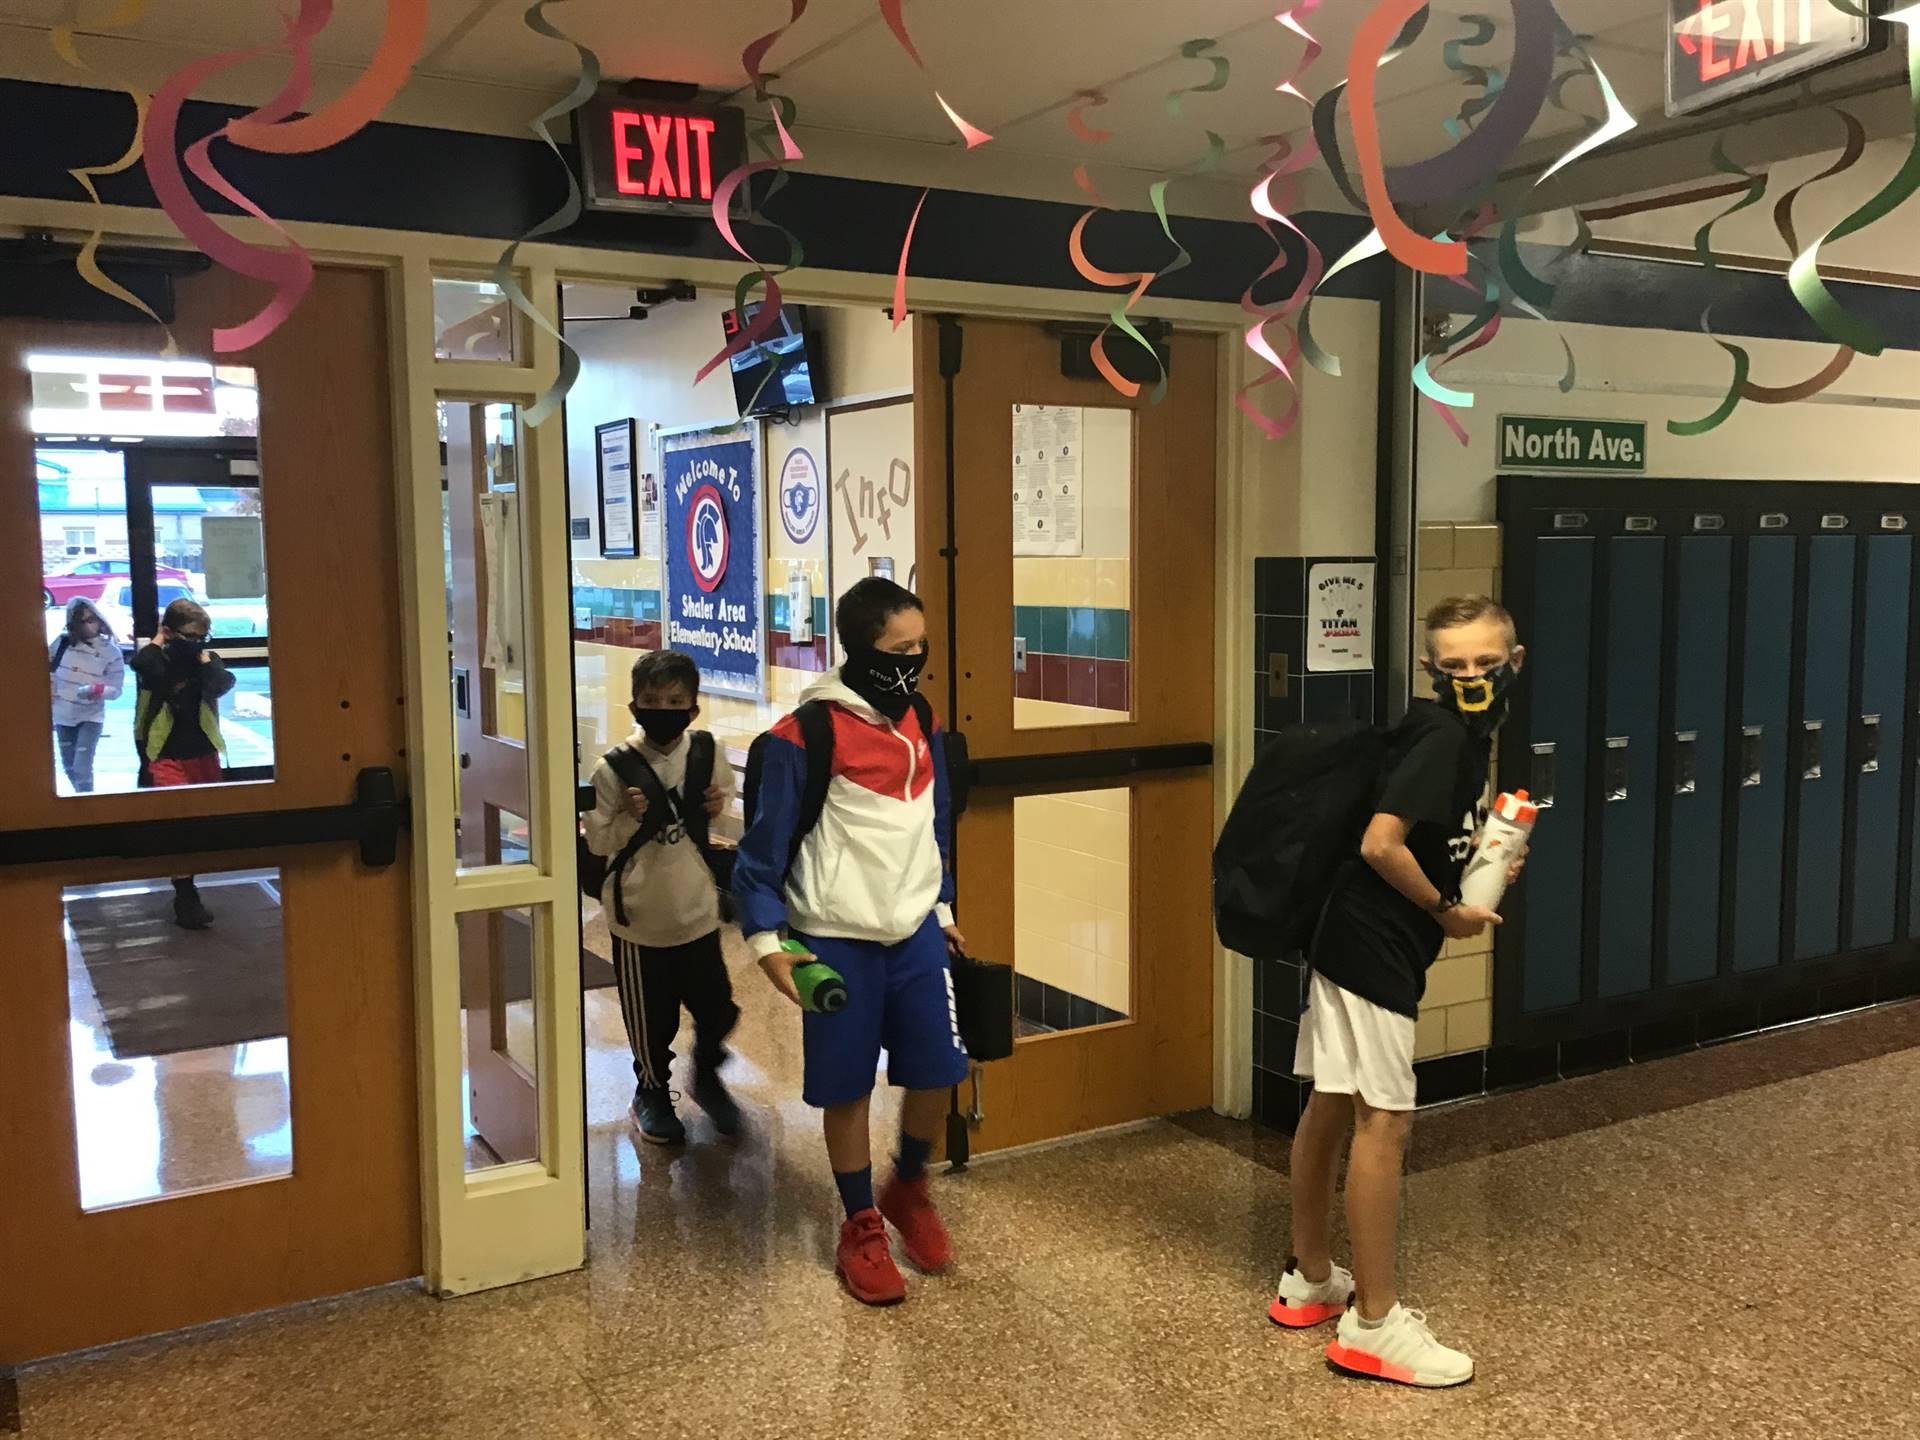 Kids entering school